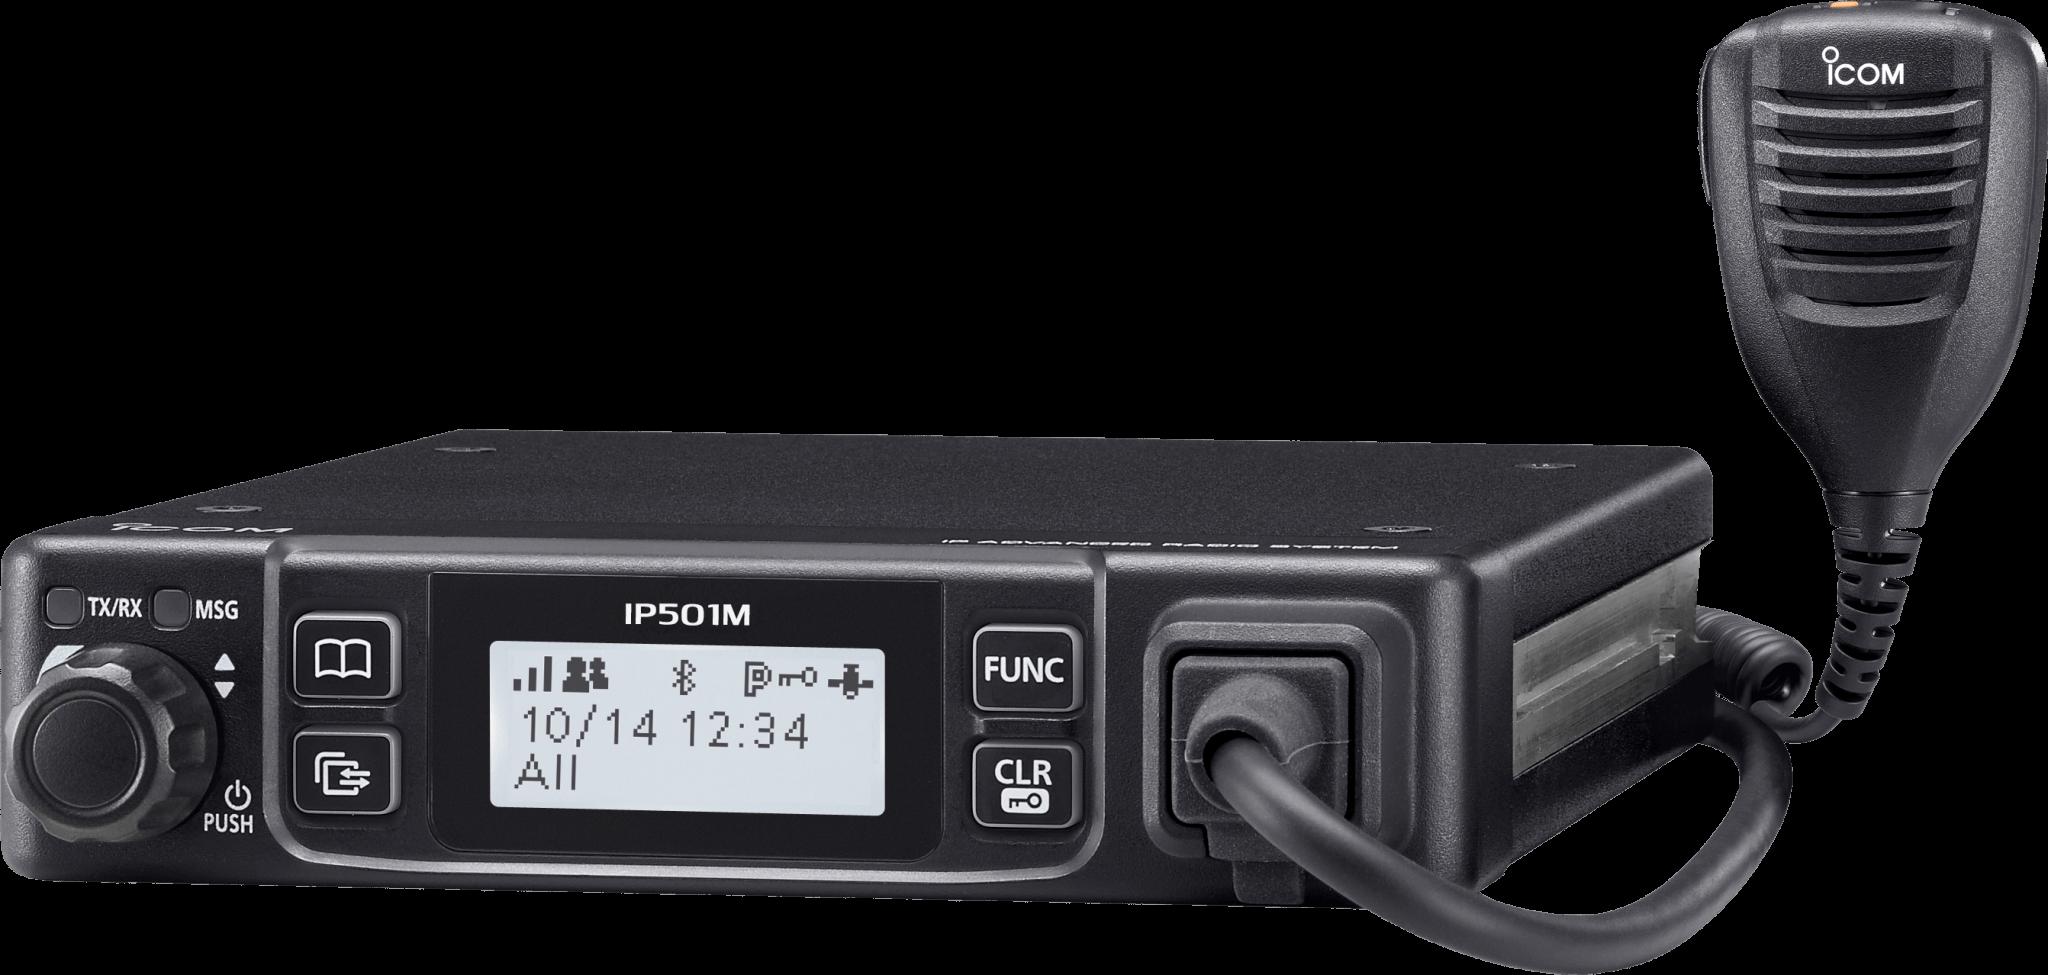 Icom IP501M featured image